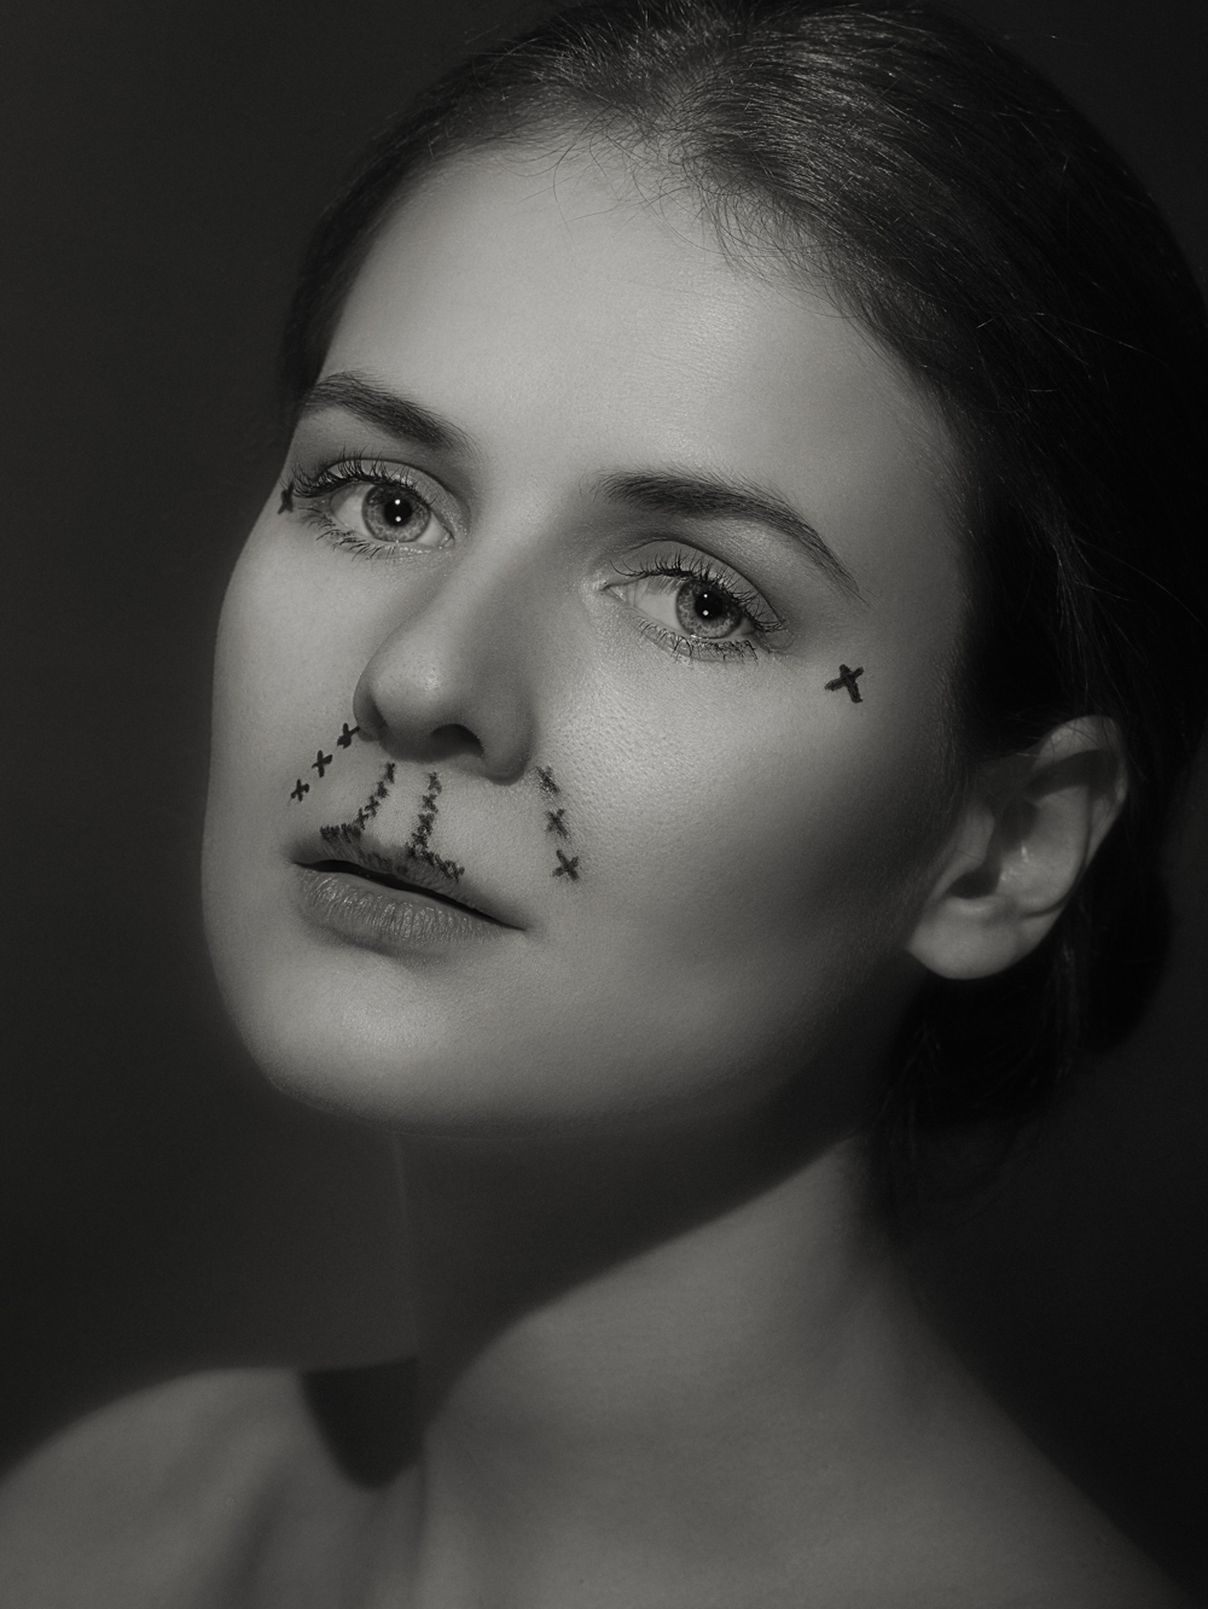 mask-perfection-plastic-surgery-everythingwithatwist-02